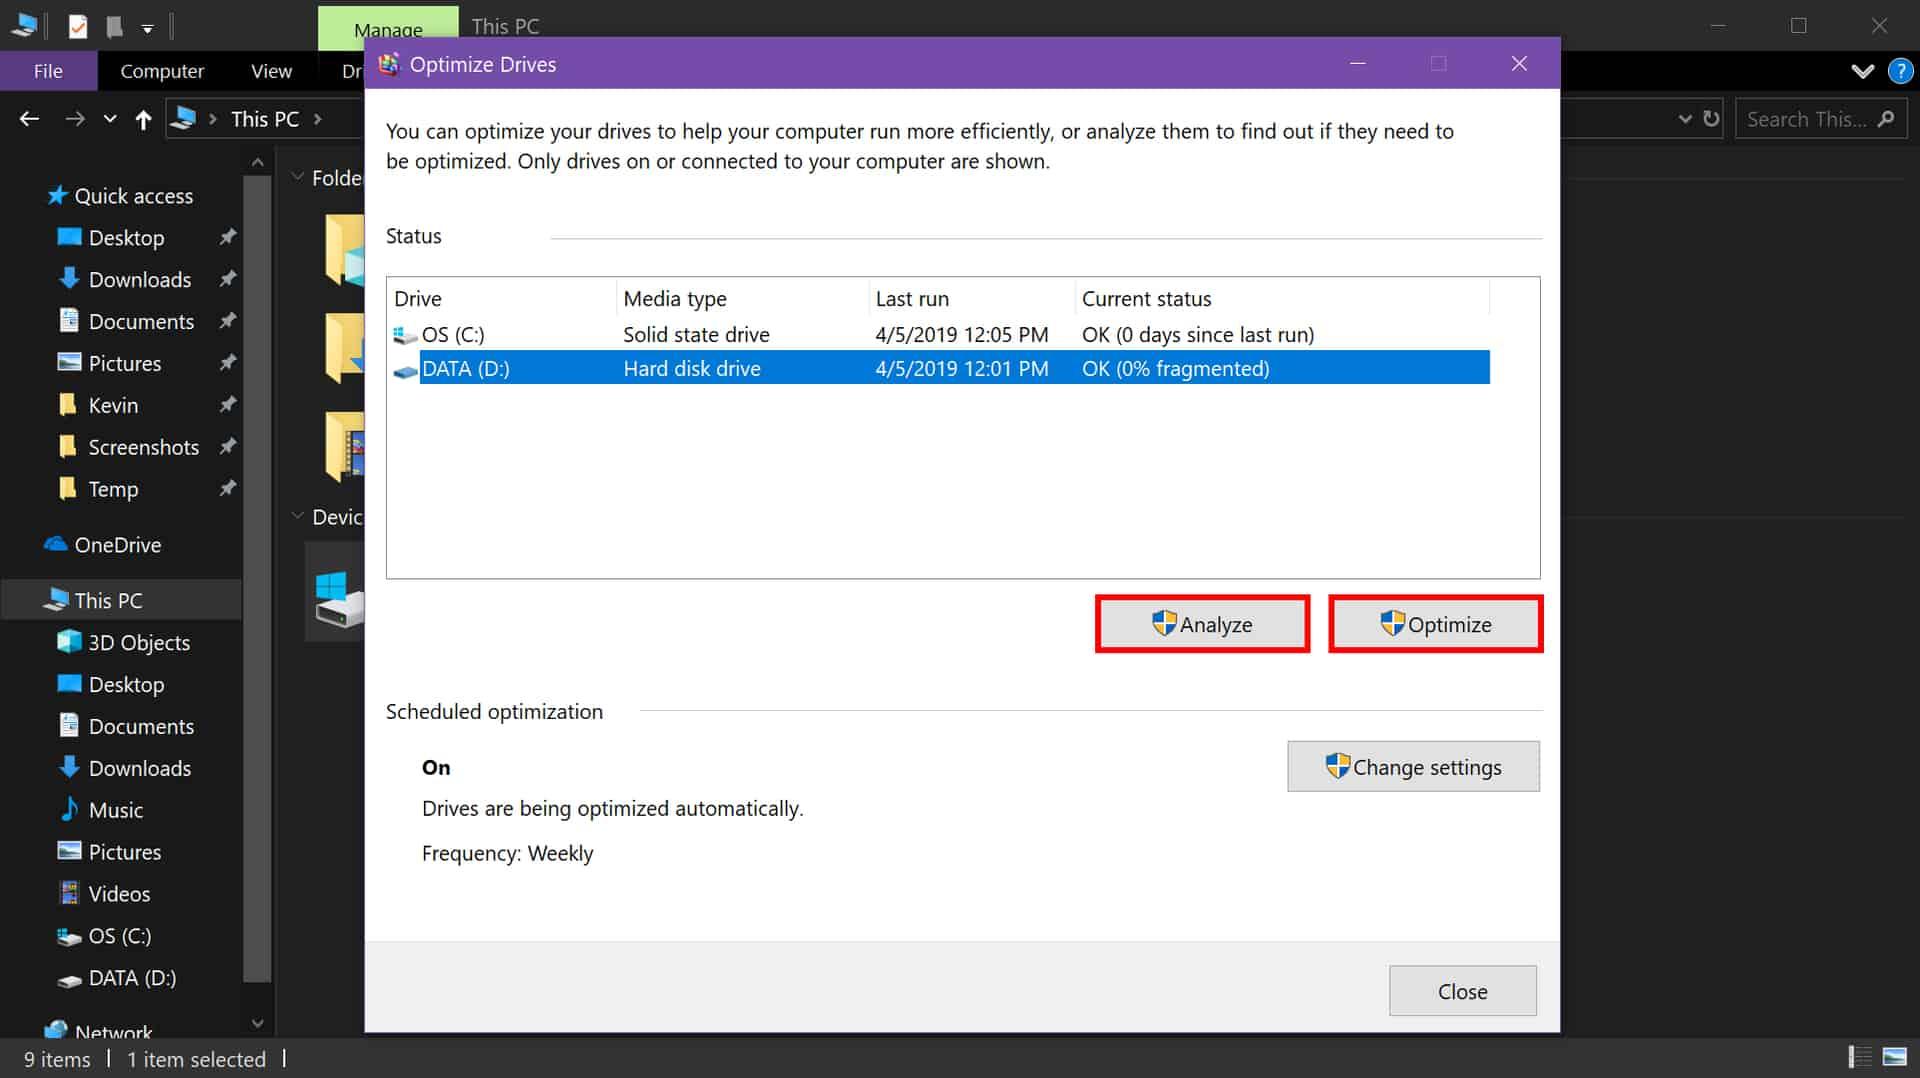 Windows 10 analyze and optimize